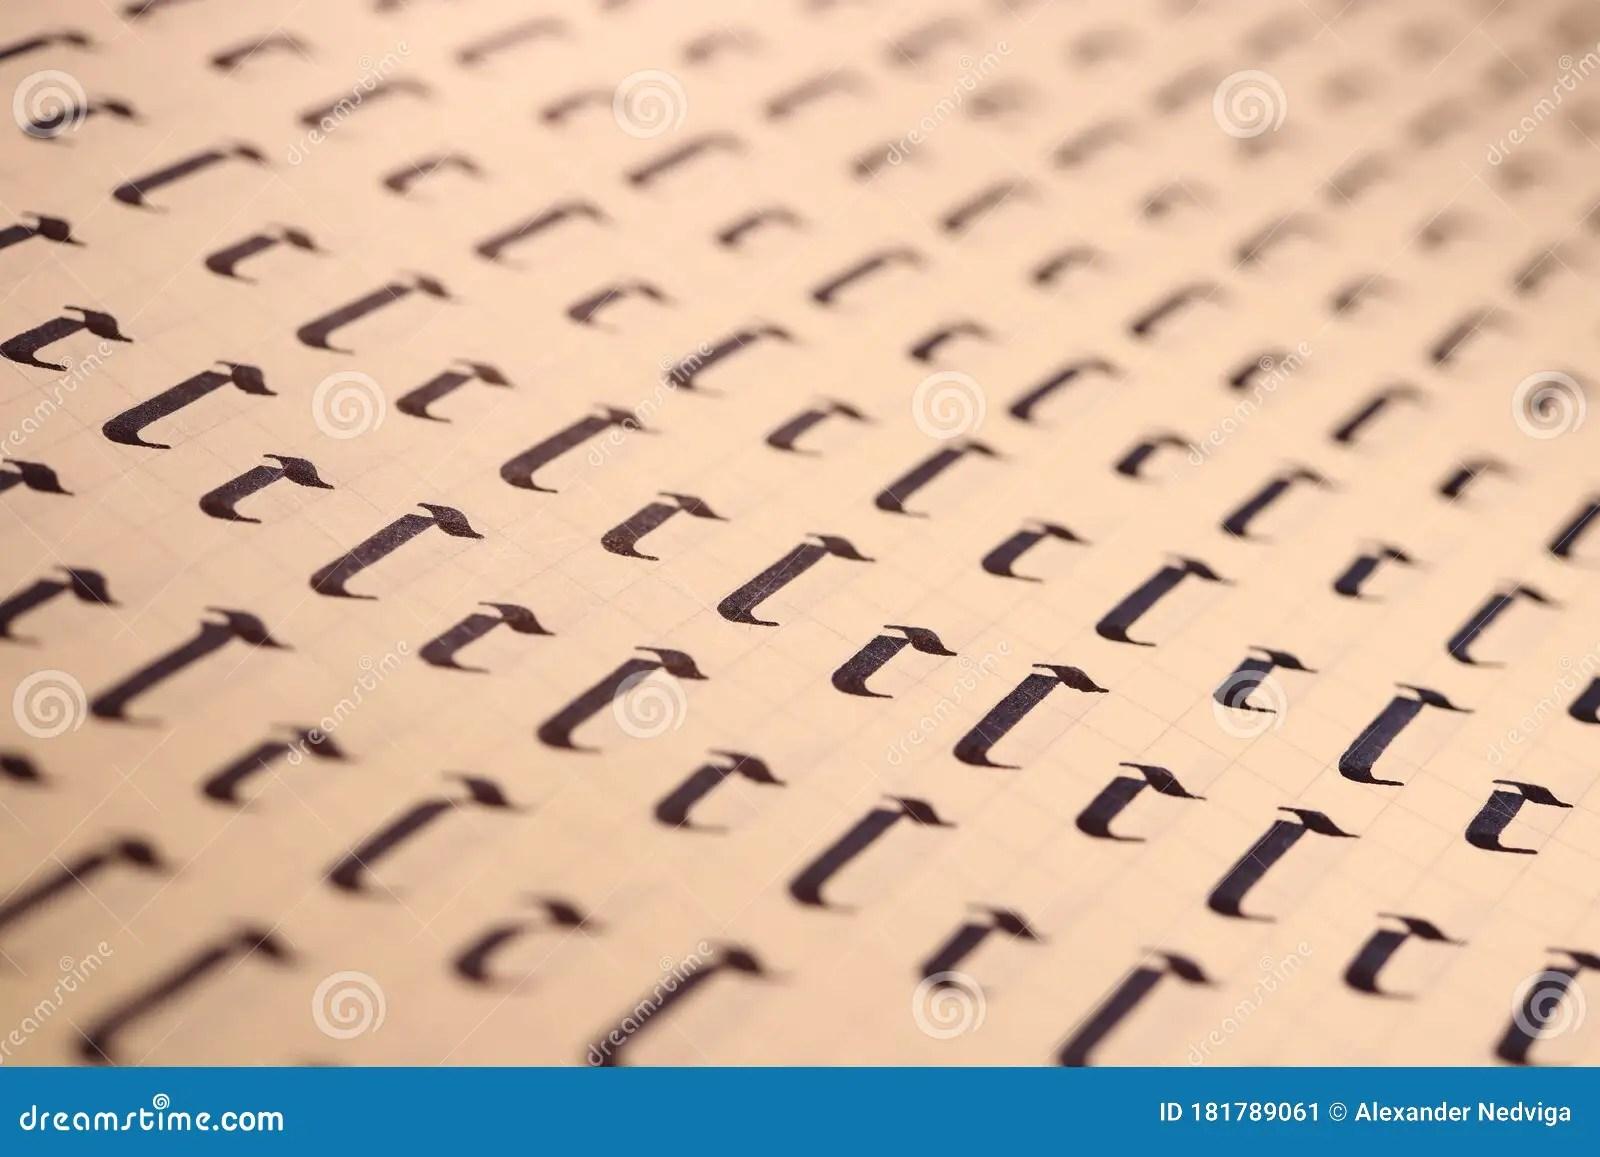 Lettering Practice Writing Worksheet Stock Image